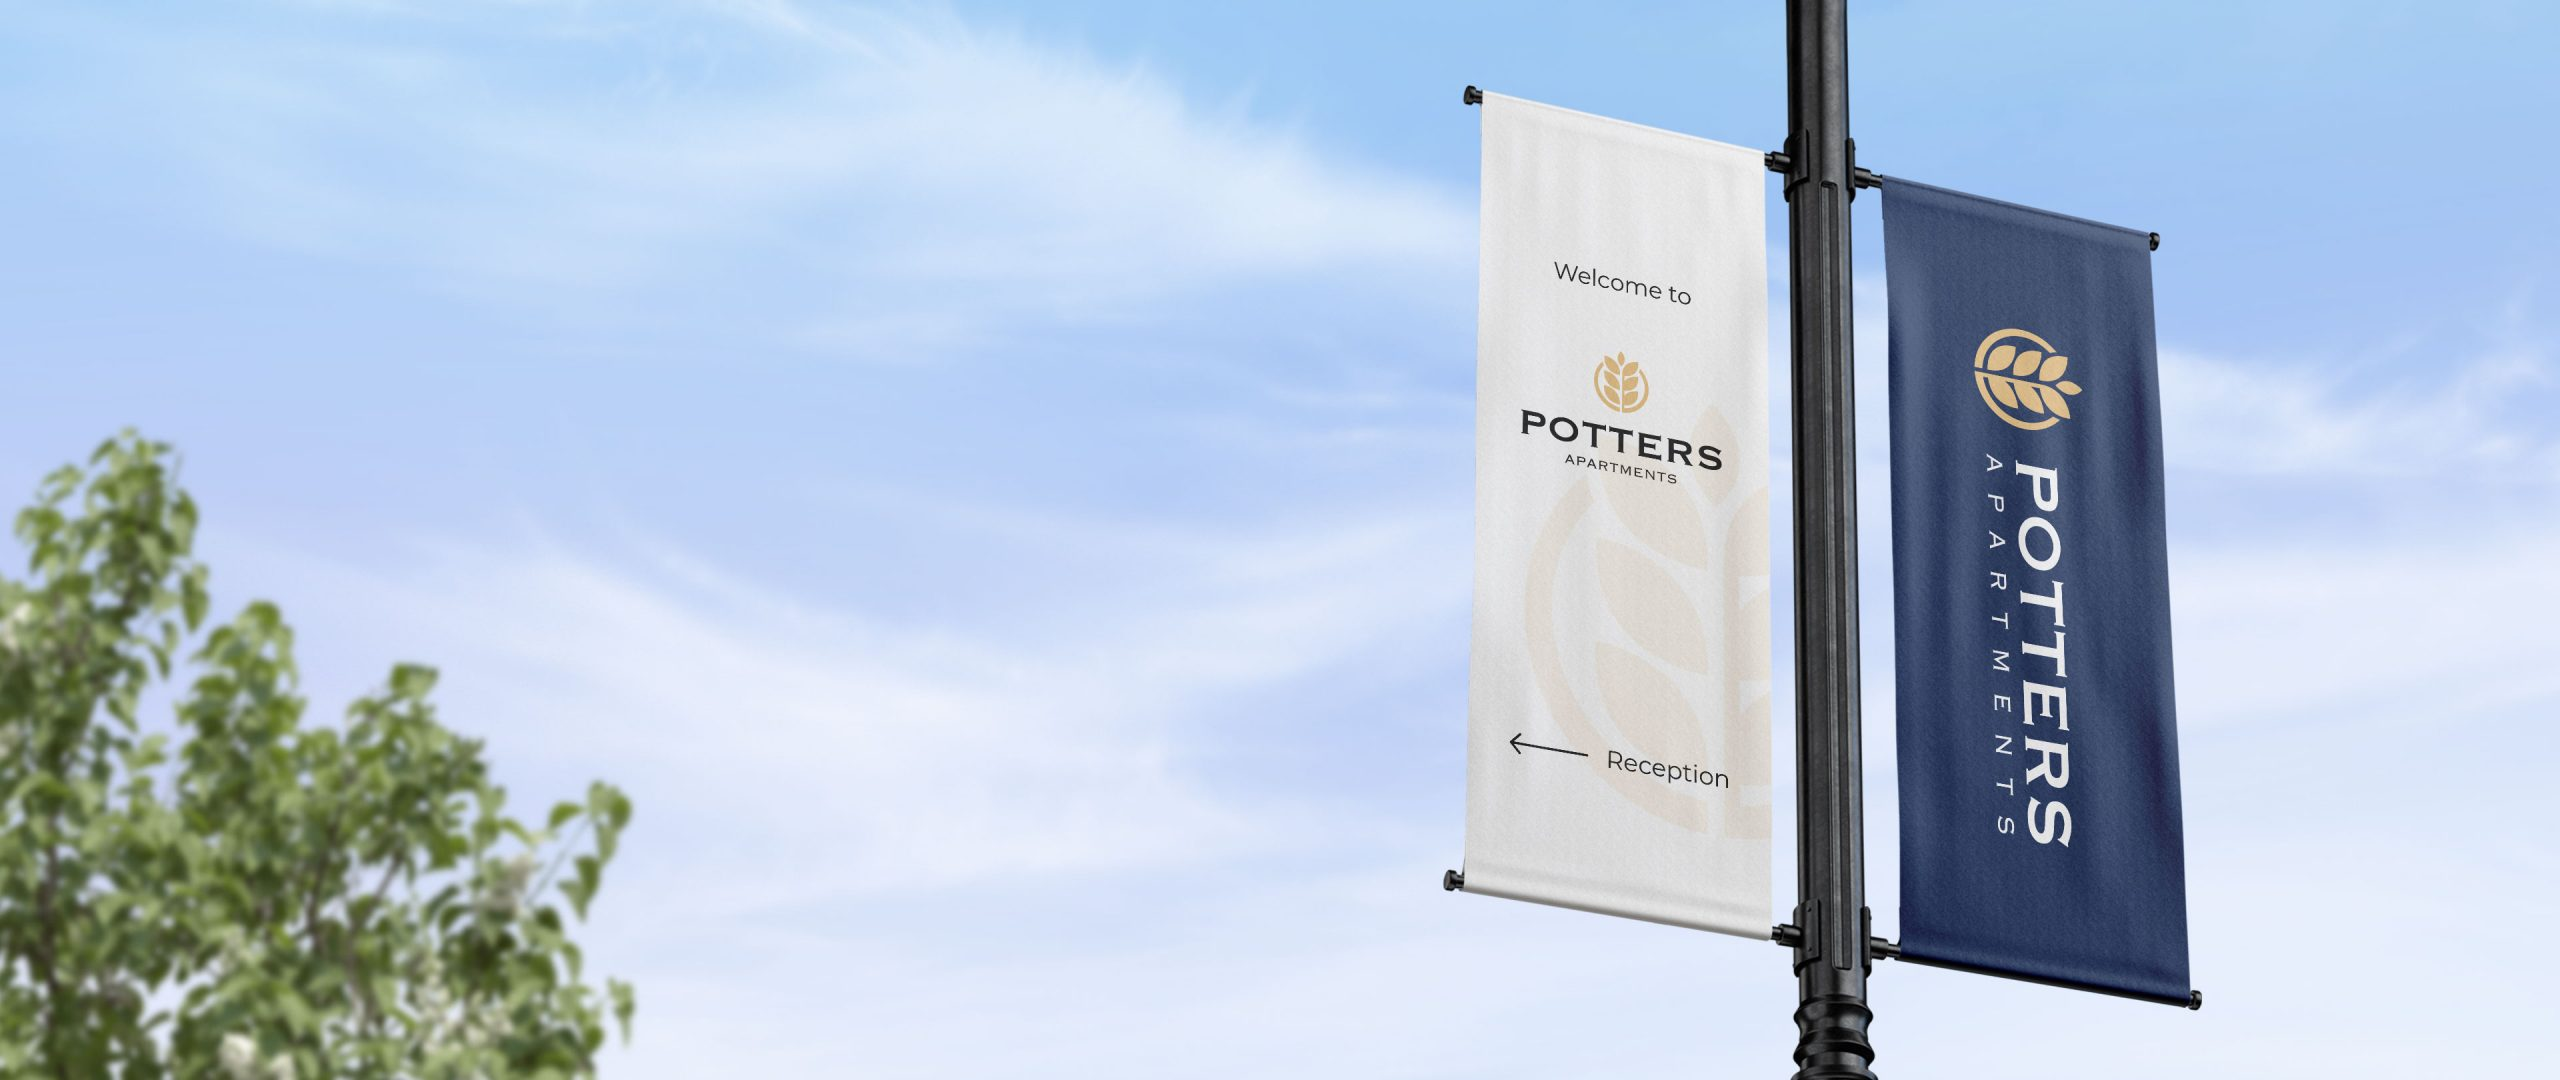 Potters Apartments